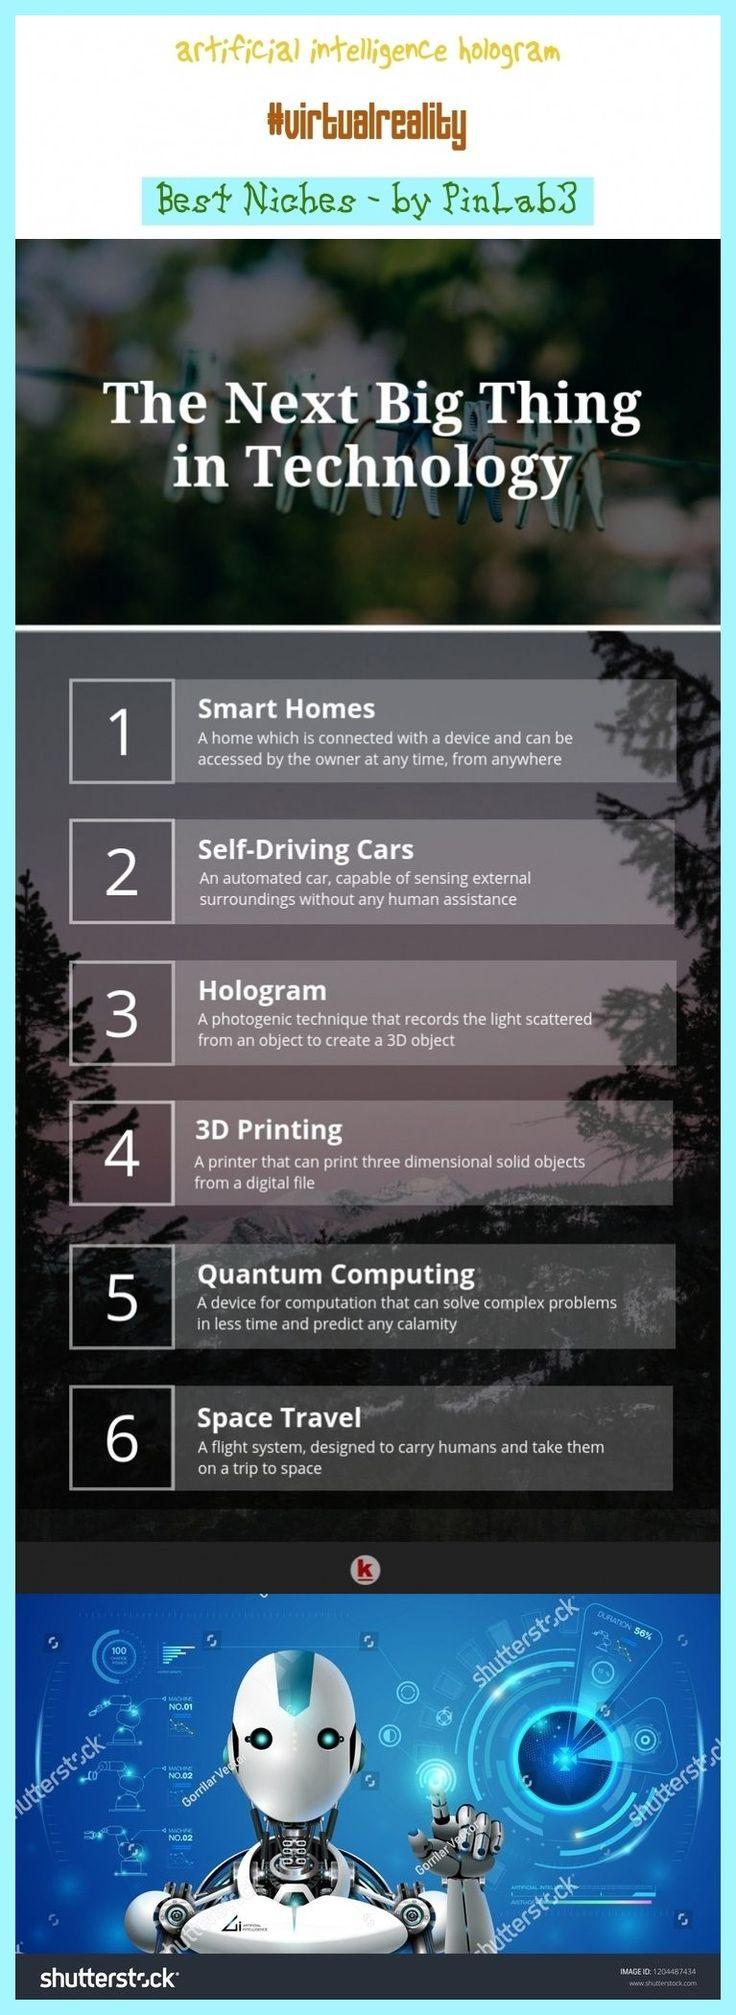 Artificial intelligence hologram #artificial #intelligence ...